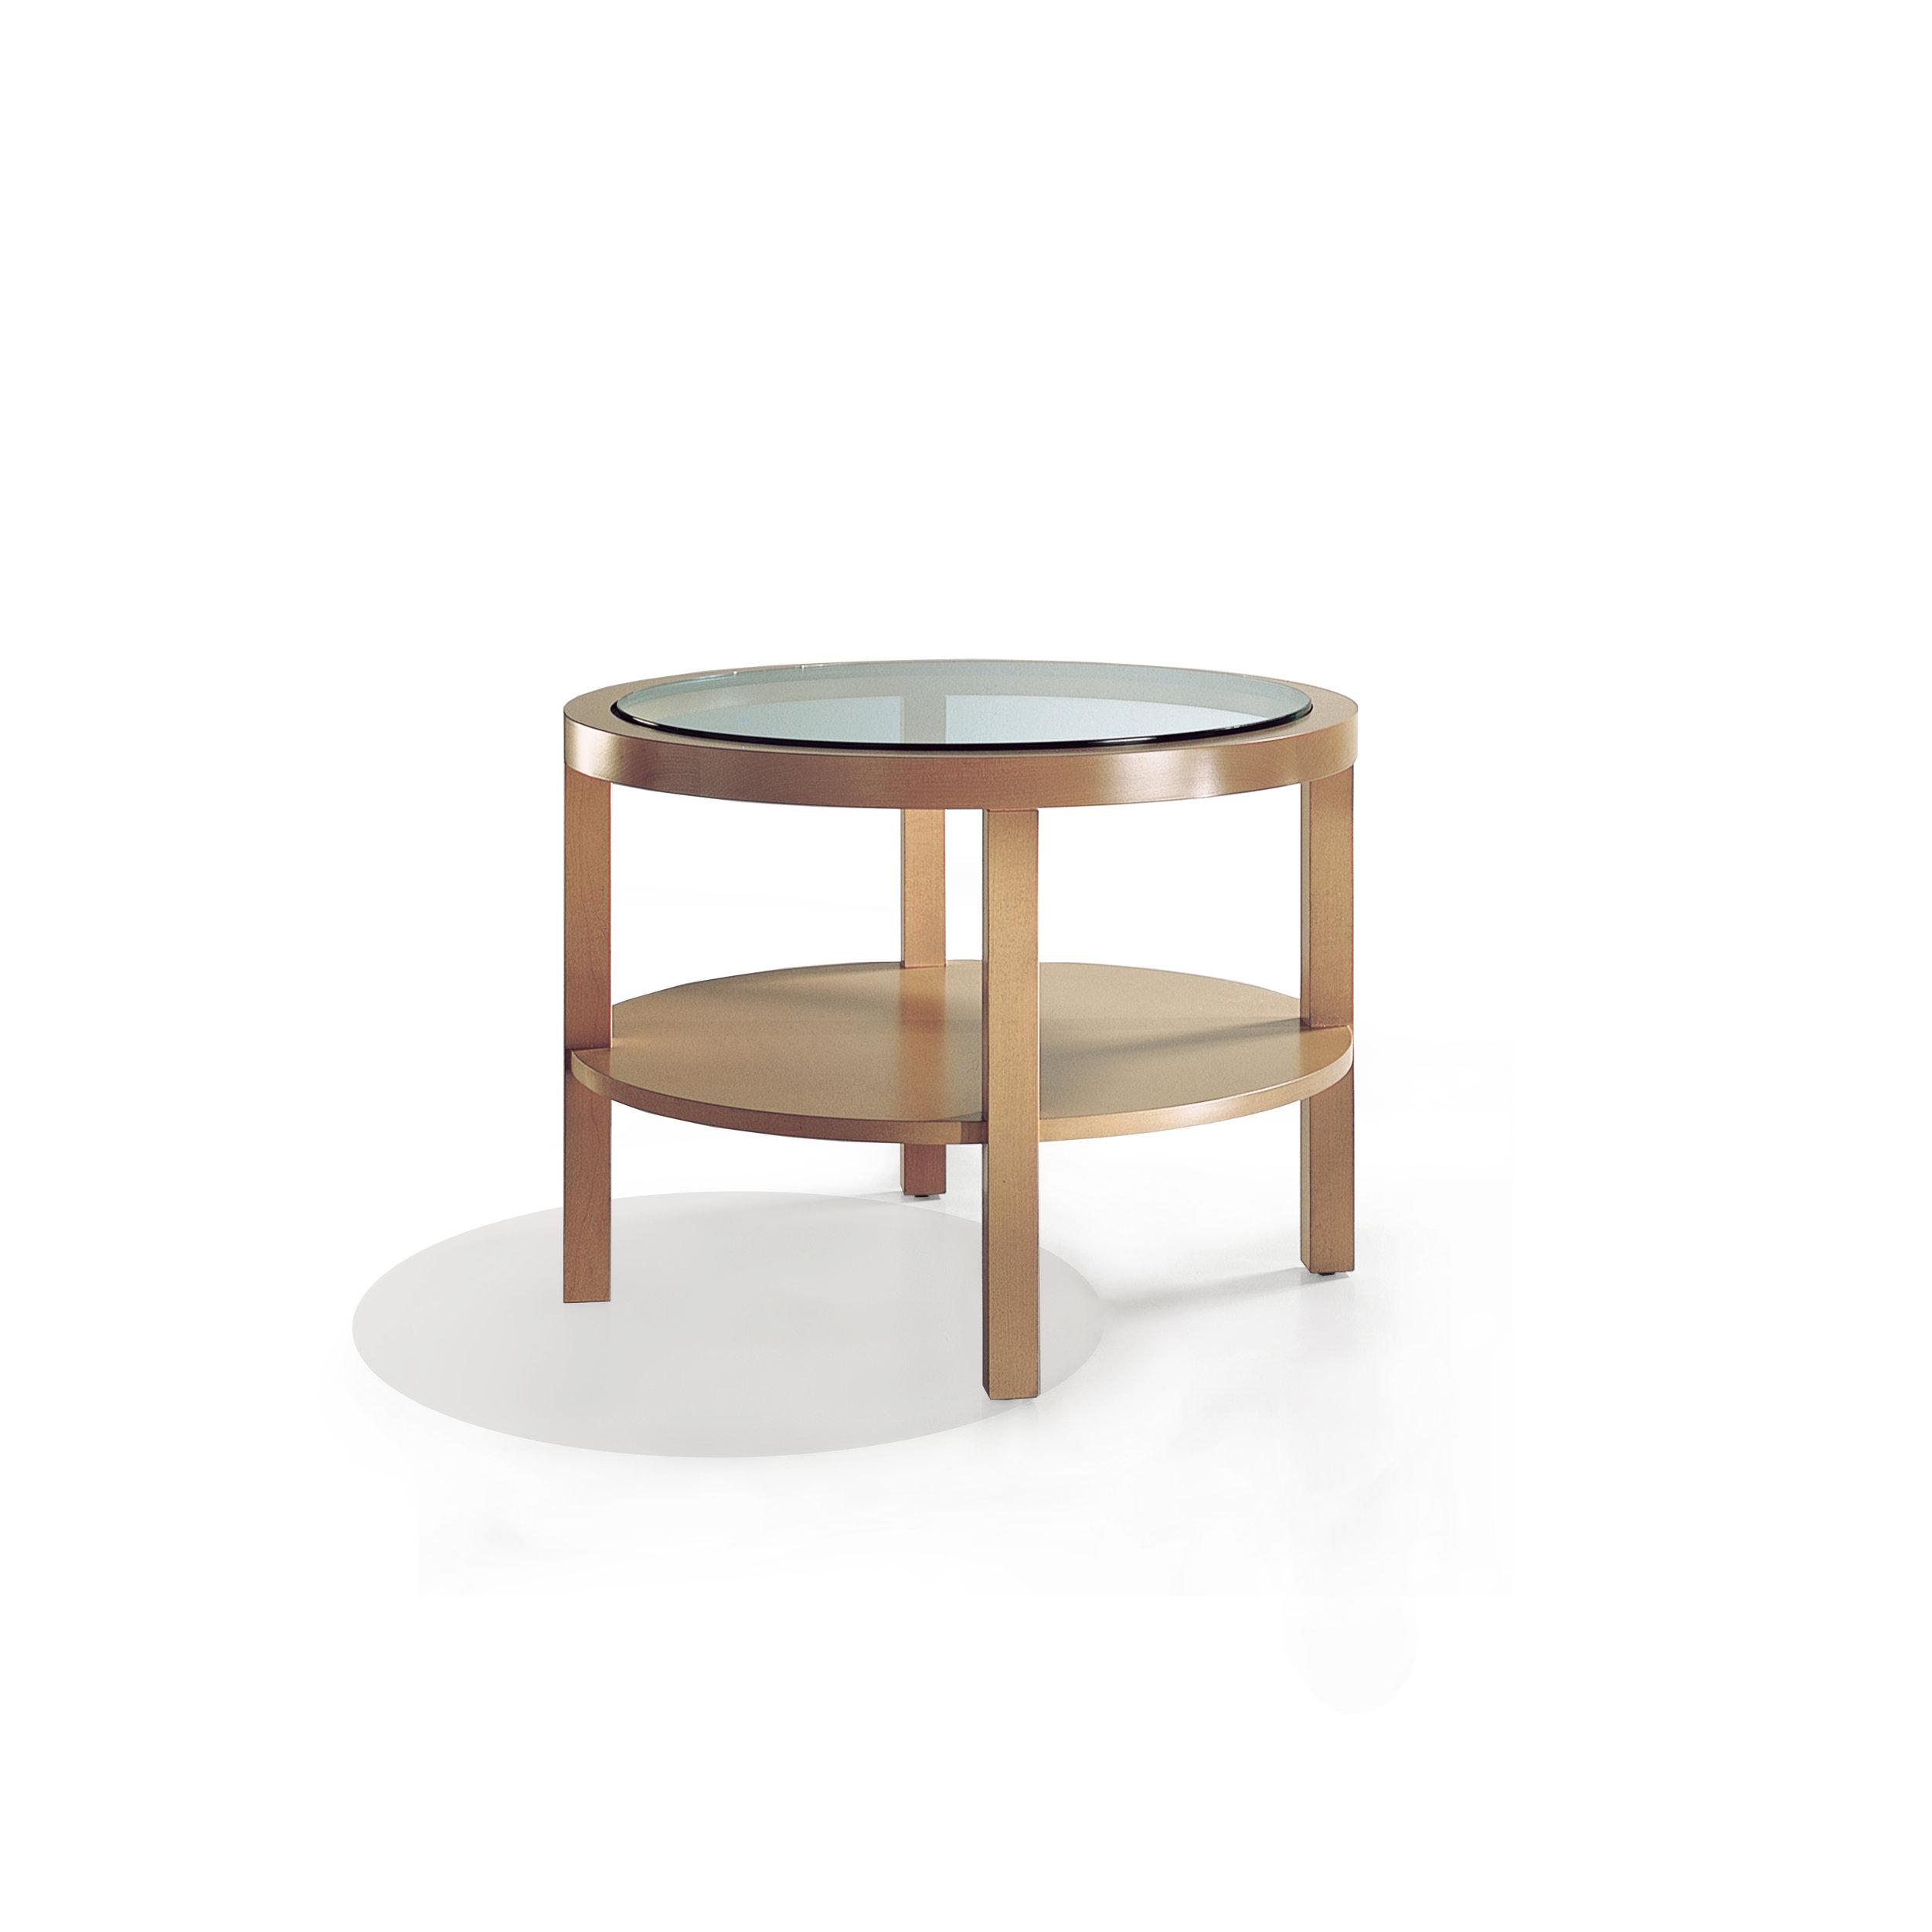 Hal_Table_Detail_01_white1_.jpg